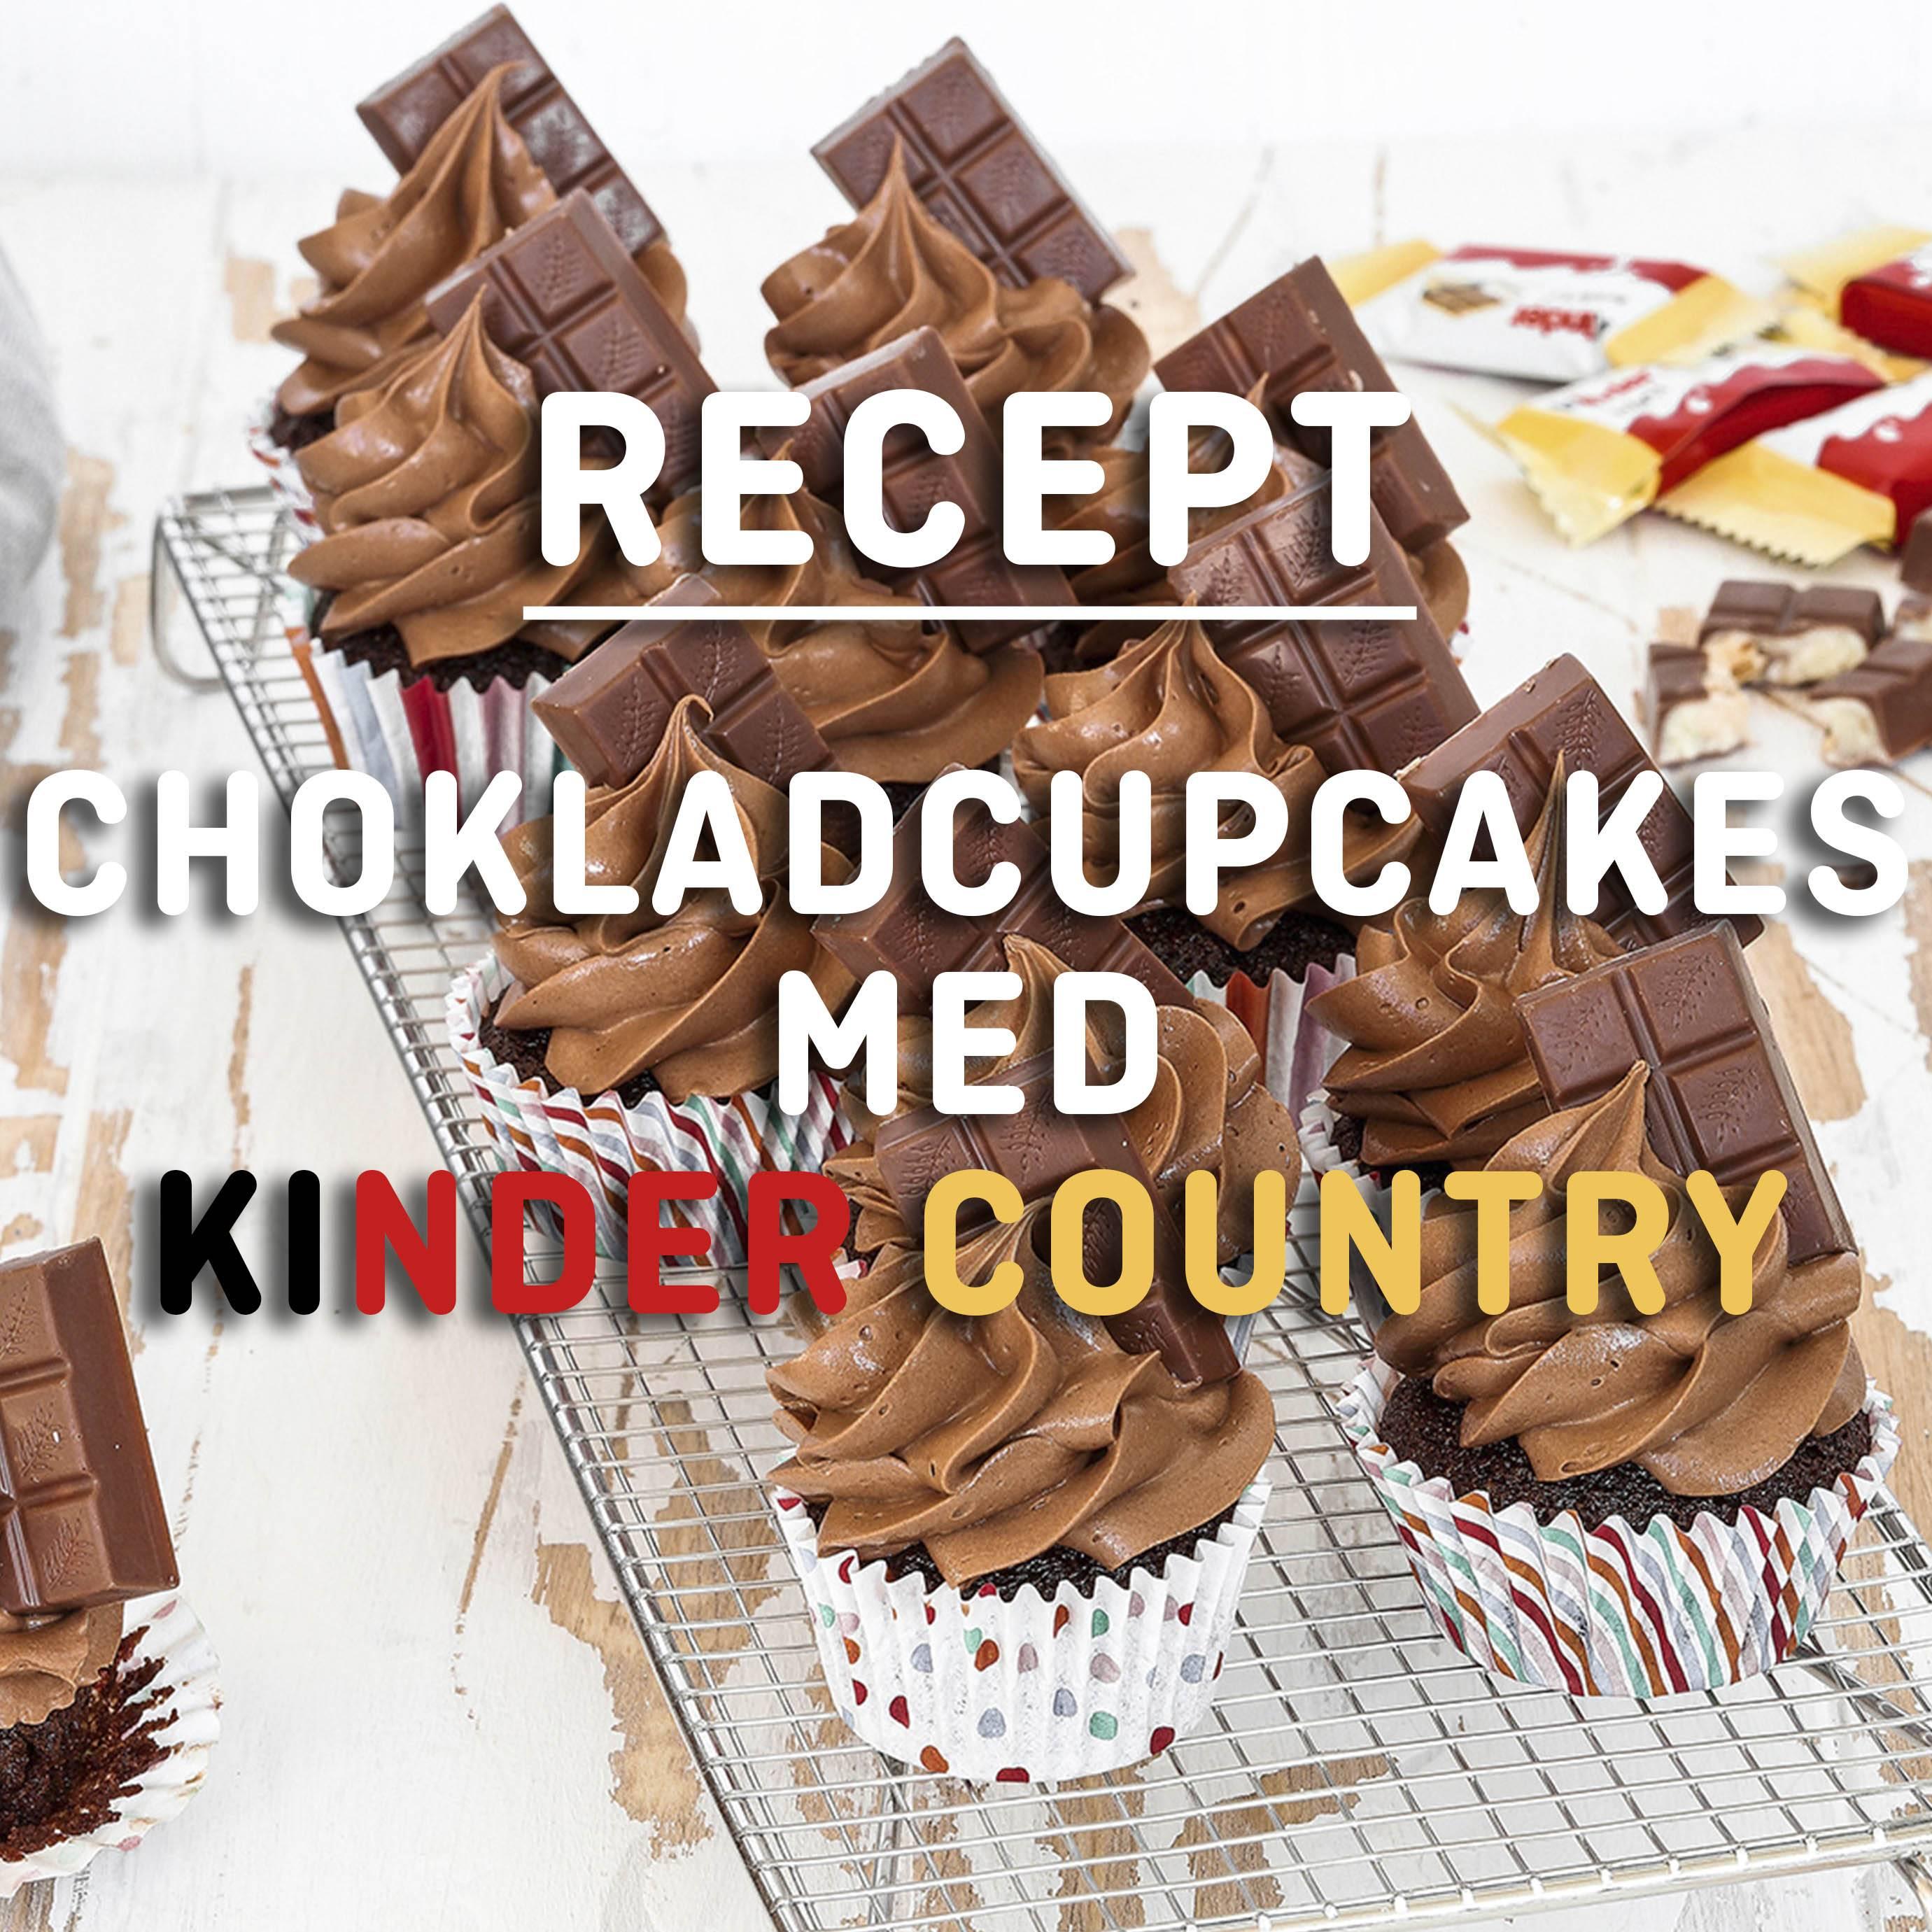 Cupcakes_webb